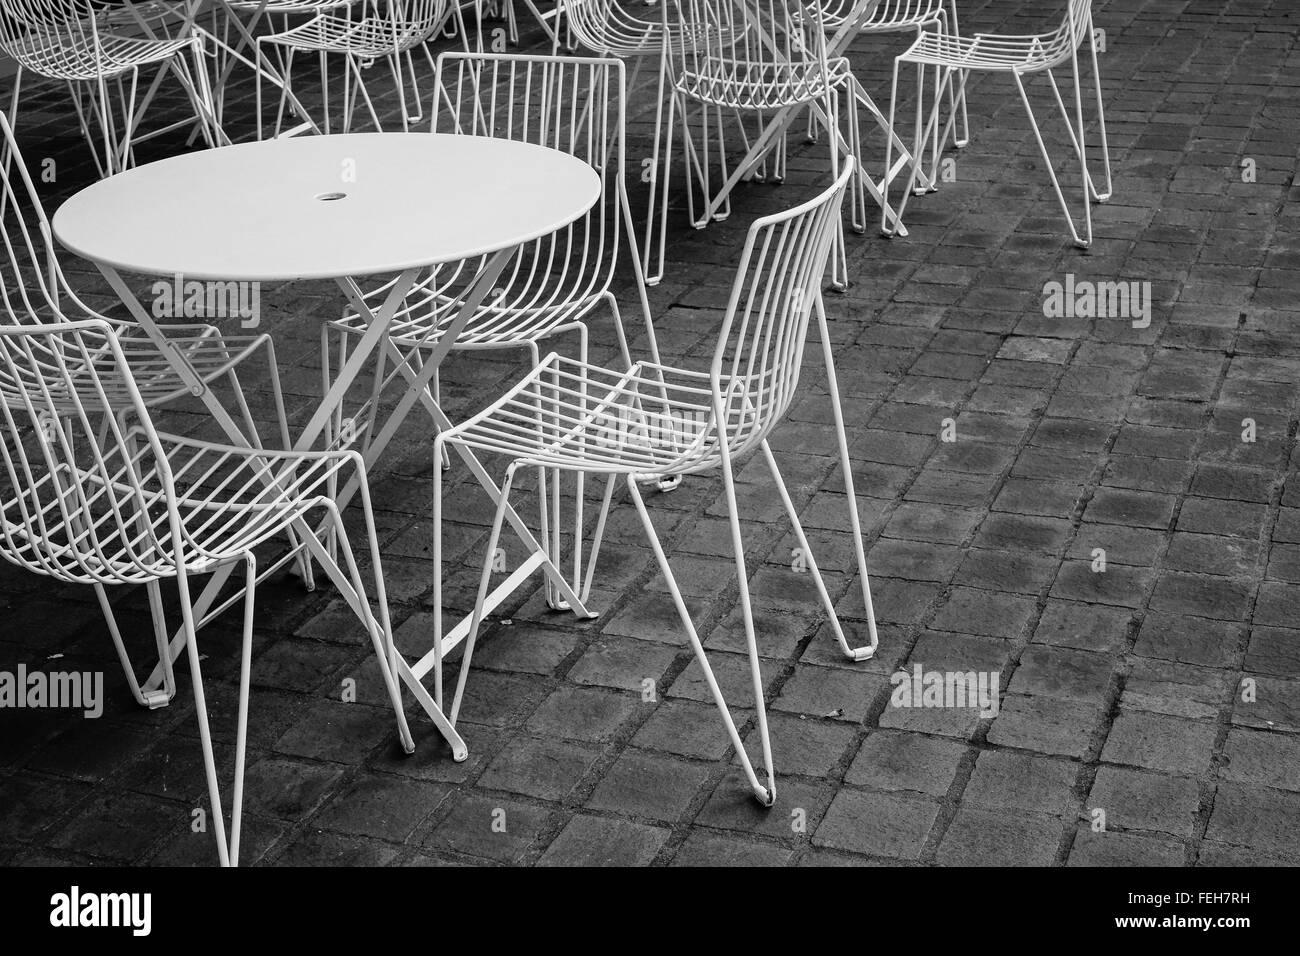 chairs sidewalk pavement Stock Photo